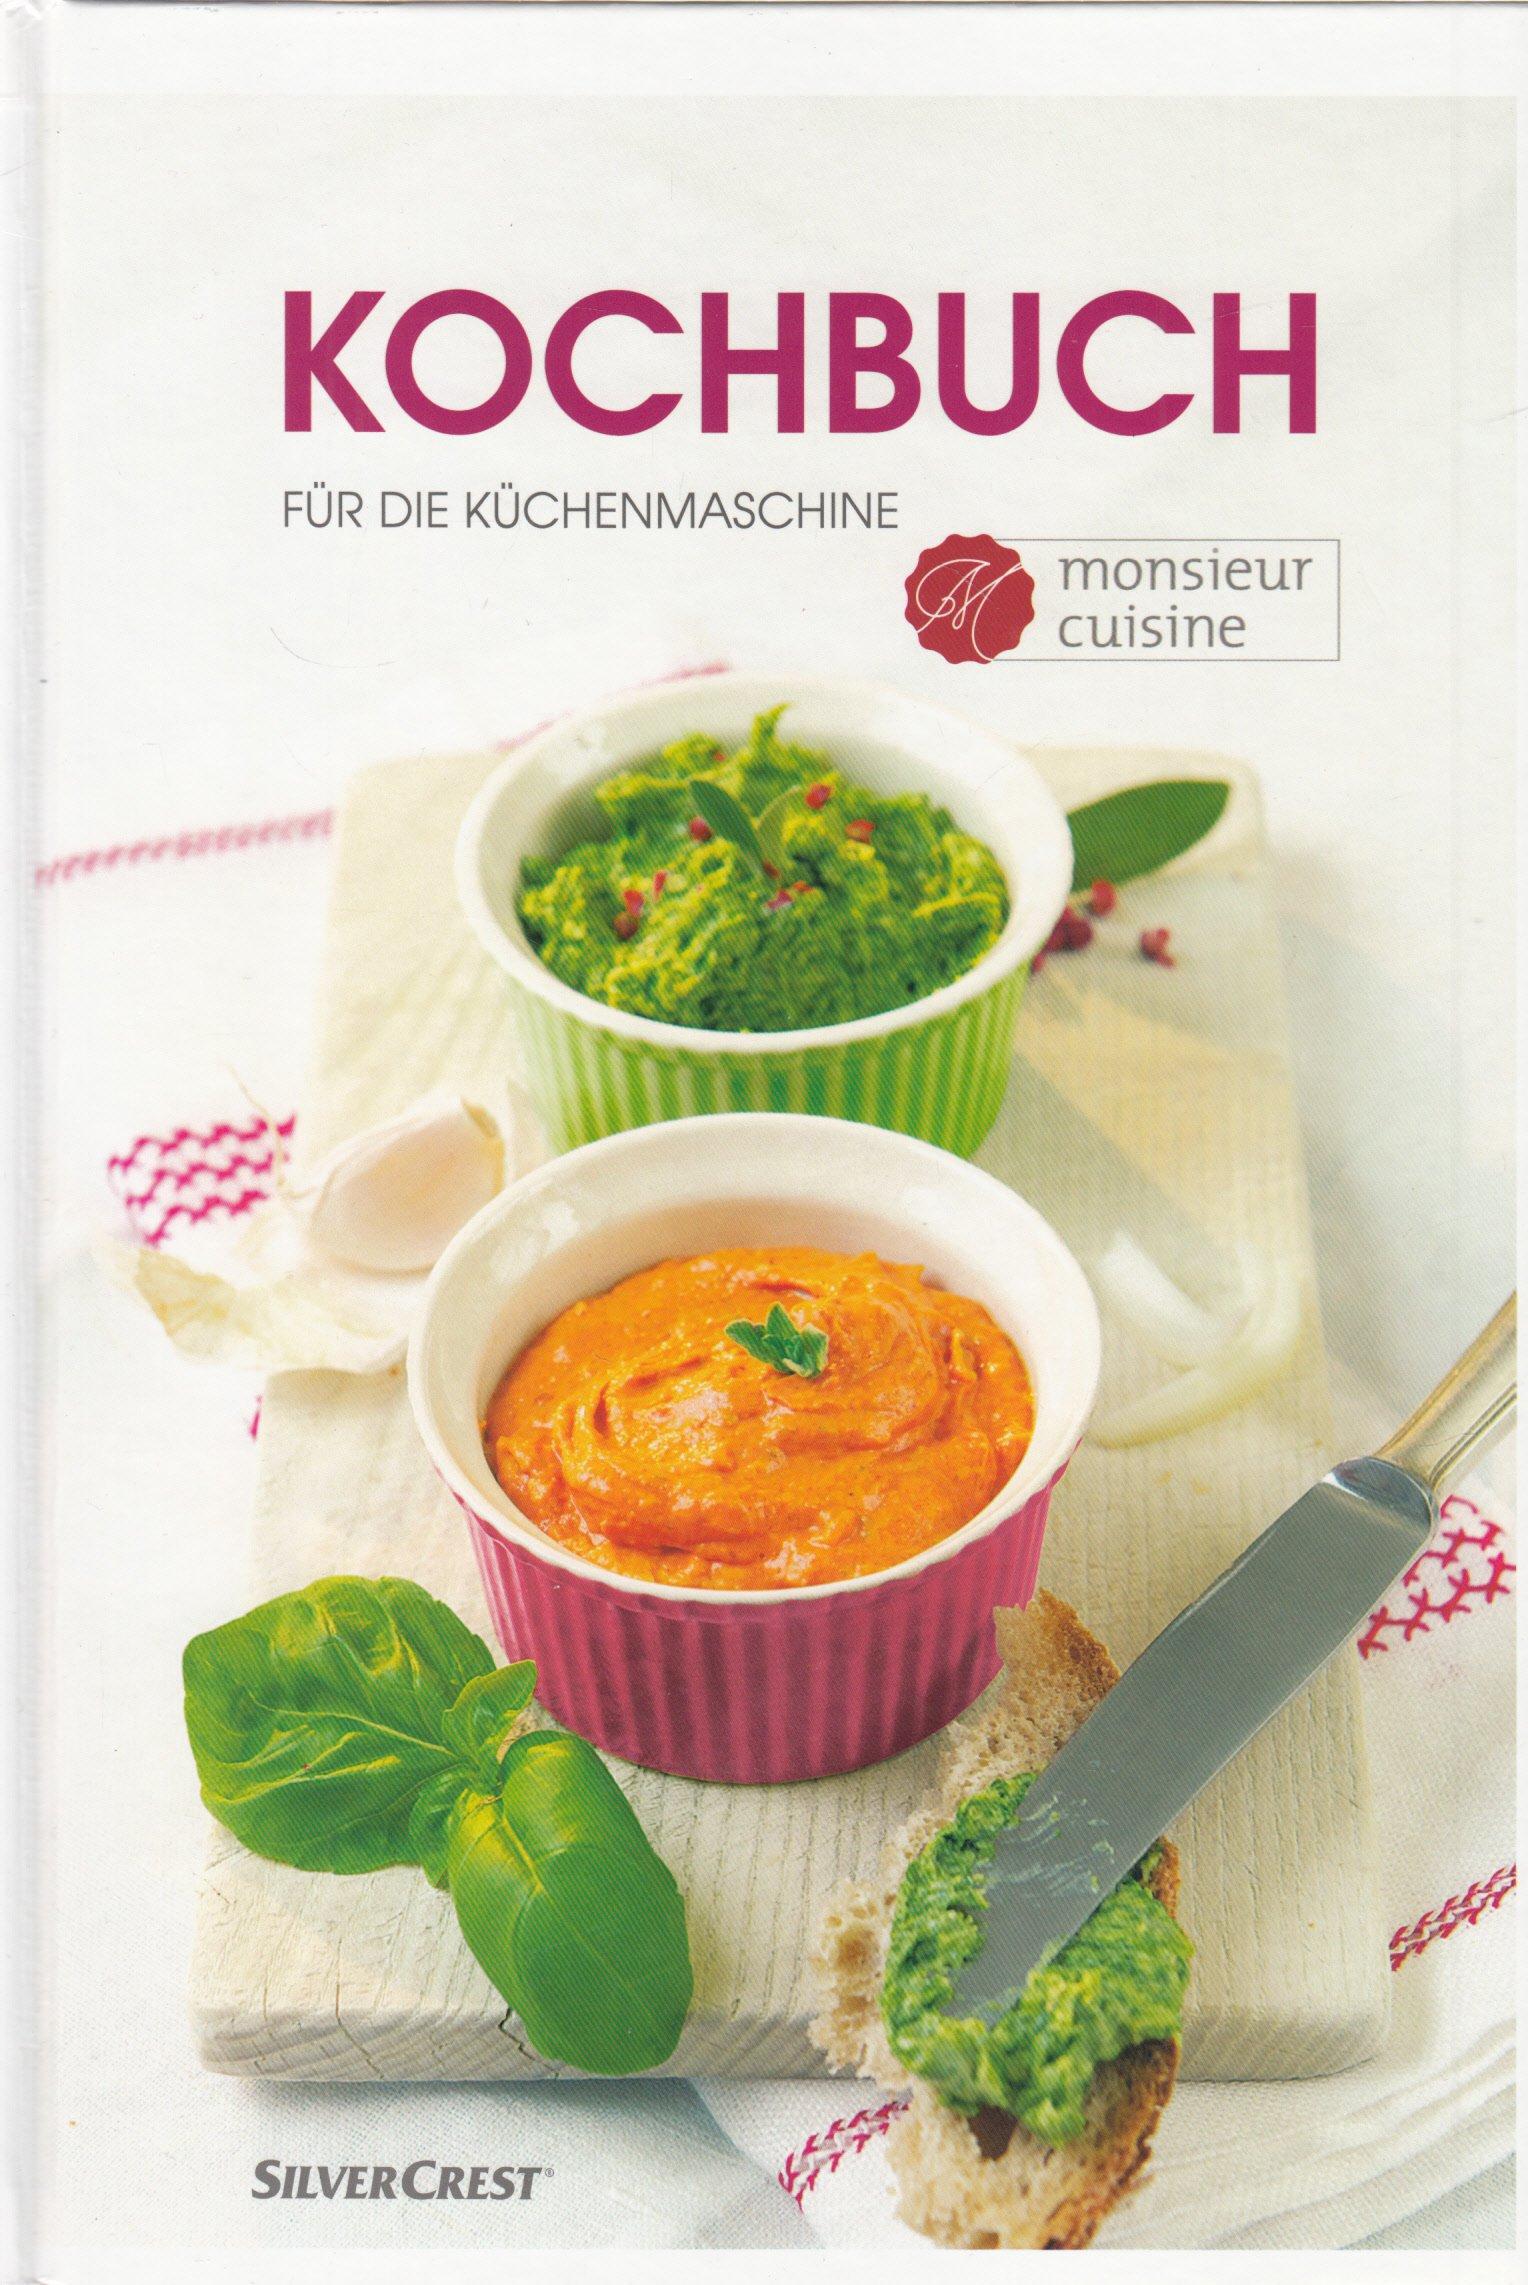 Kochbuch Fur Die Kuchenmaschine Monsieur Cuisine Amazon De Silver